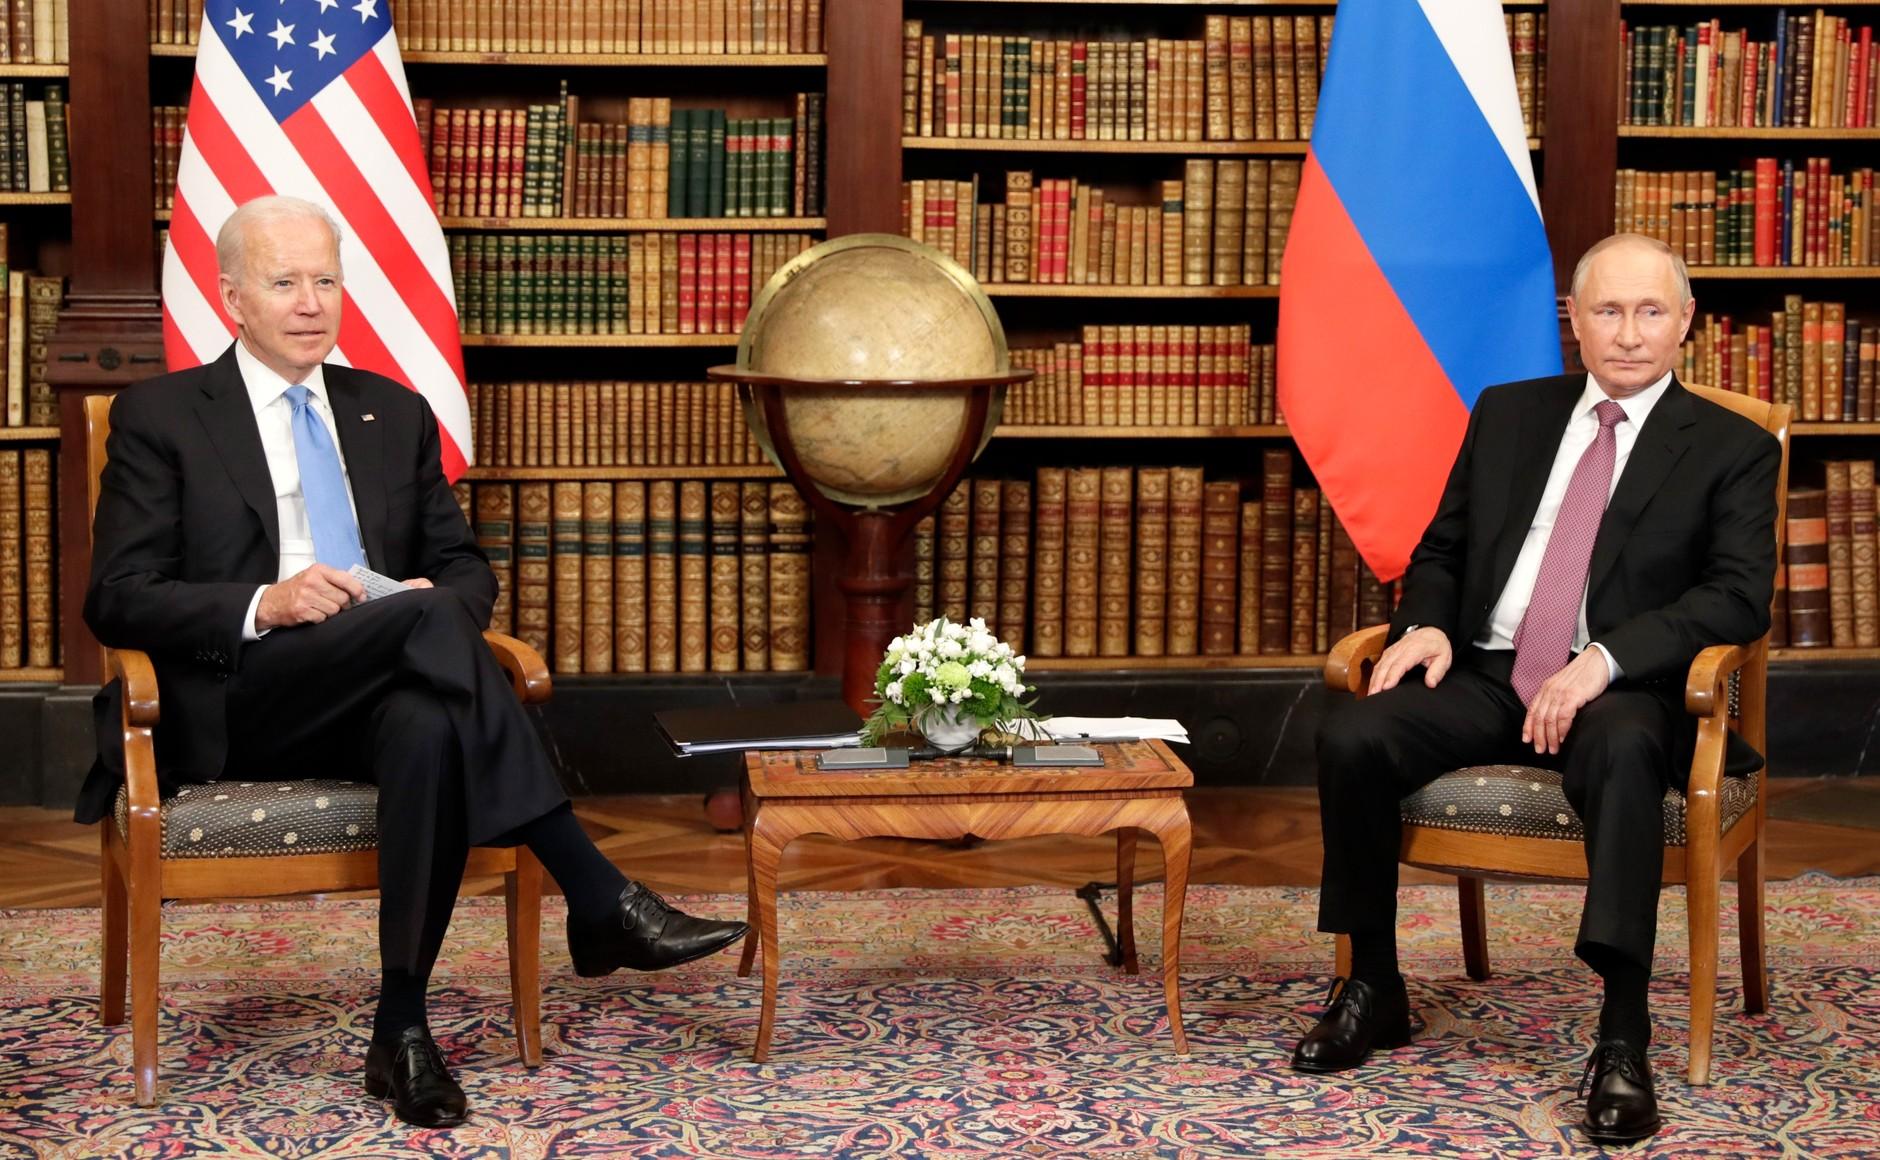 Steps in the right direction at the Biden-Putin Geneva Summit